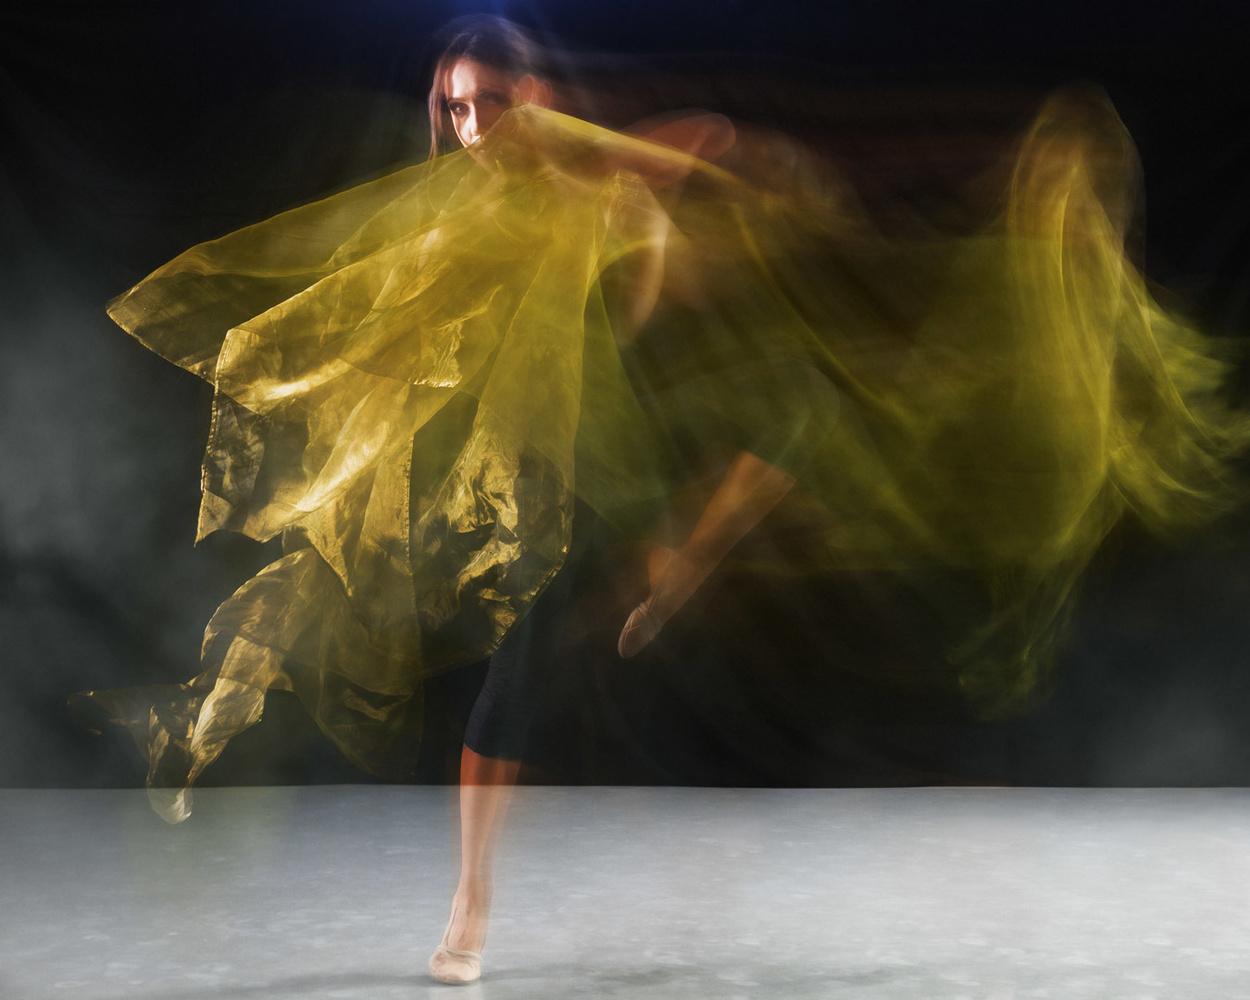 Let it flow. by Michael Kloetzer